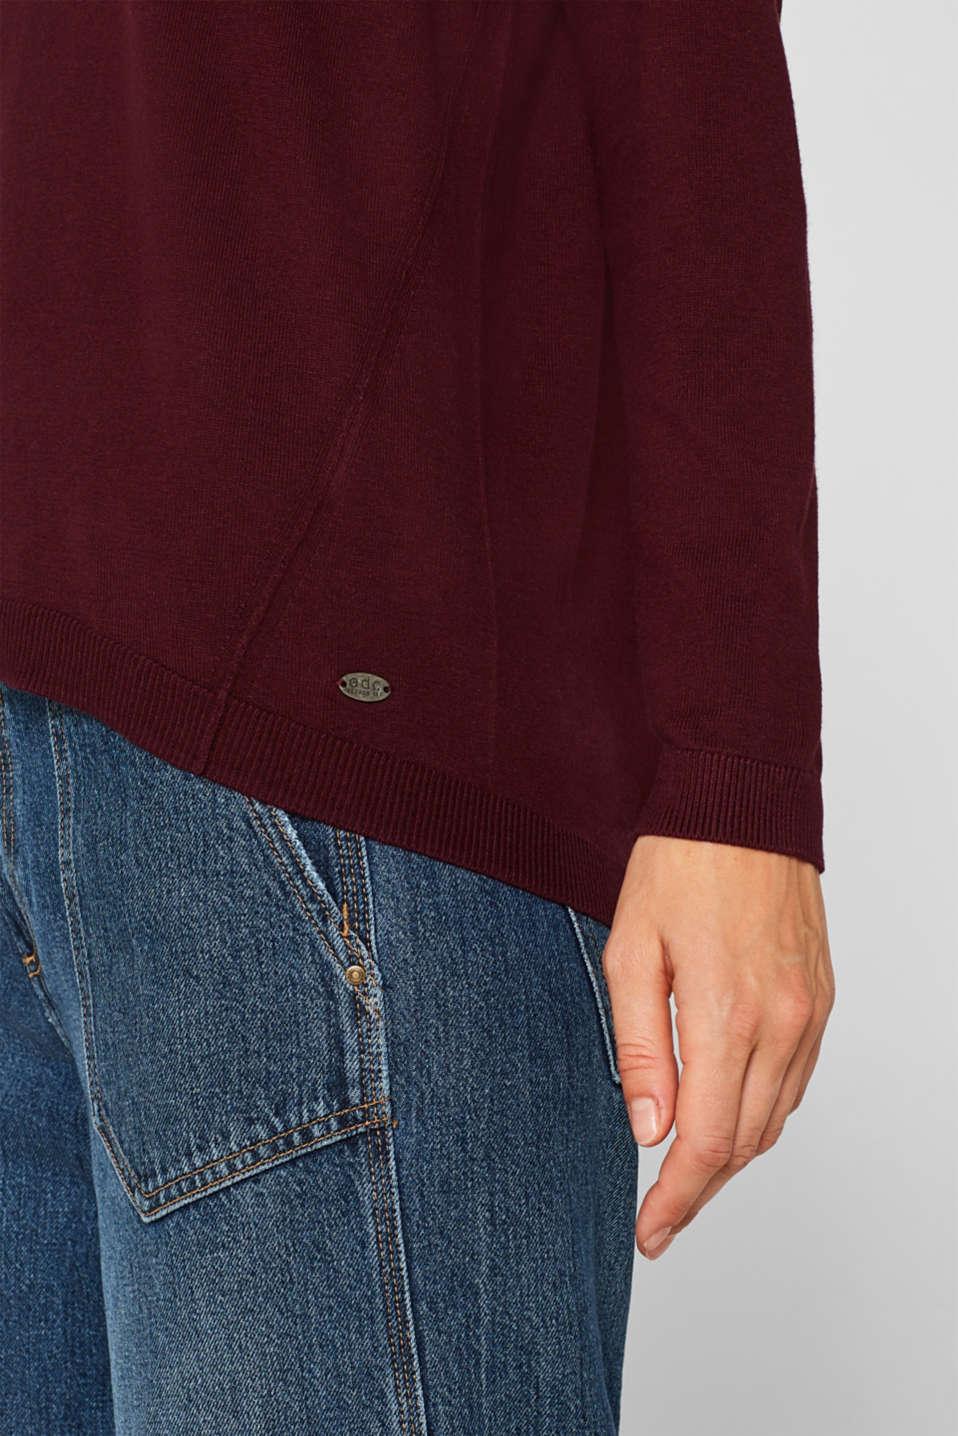 Fine knit jumper with on-trend details, BORDEAUX RED, detail image number 2